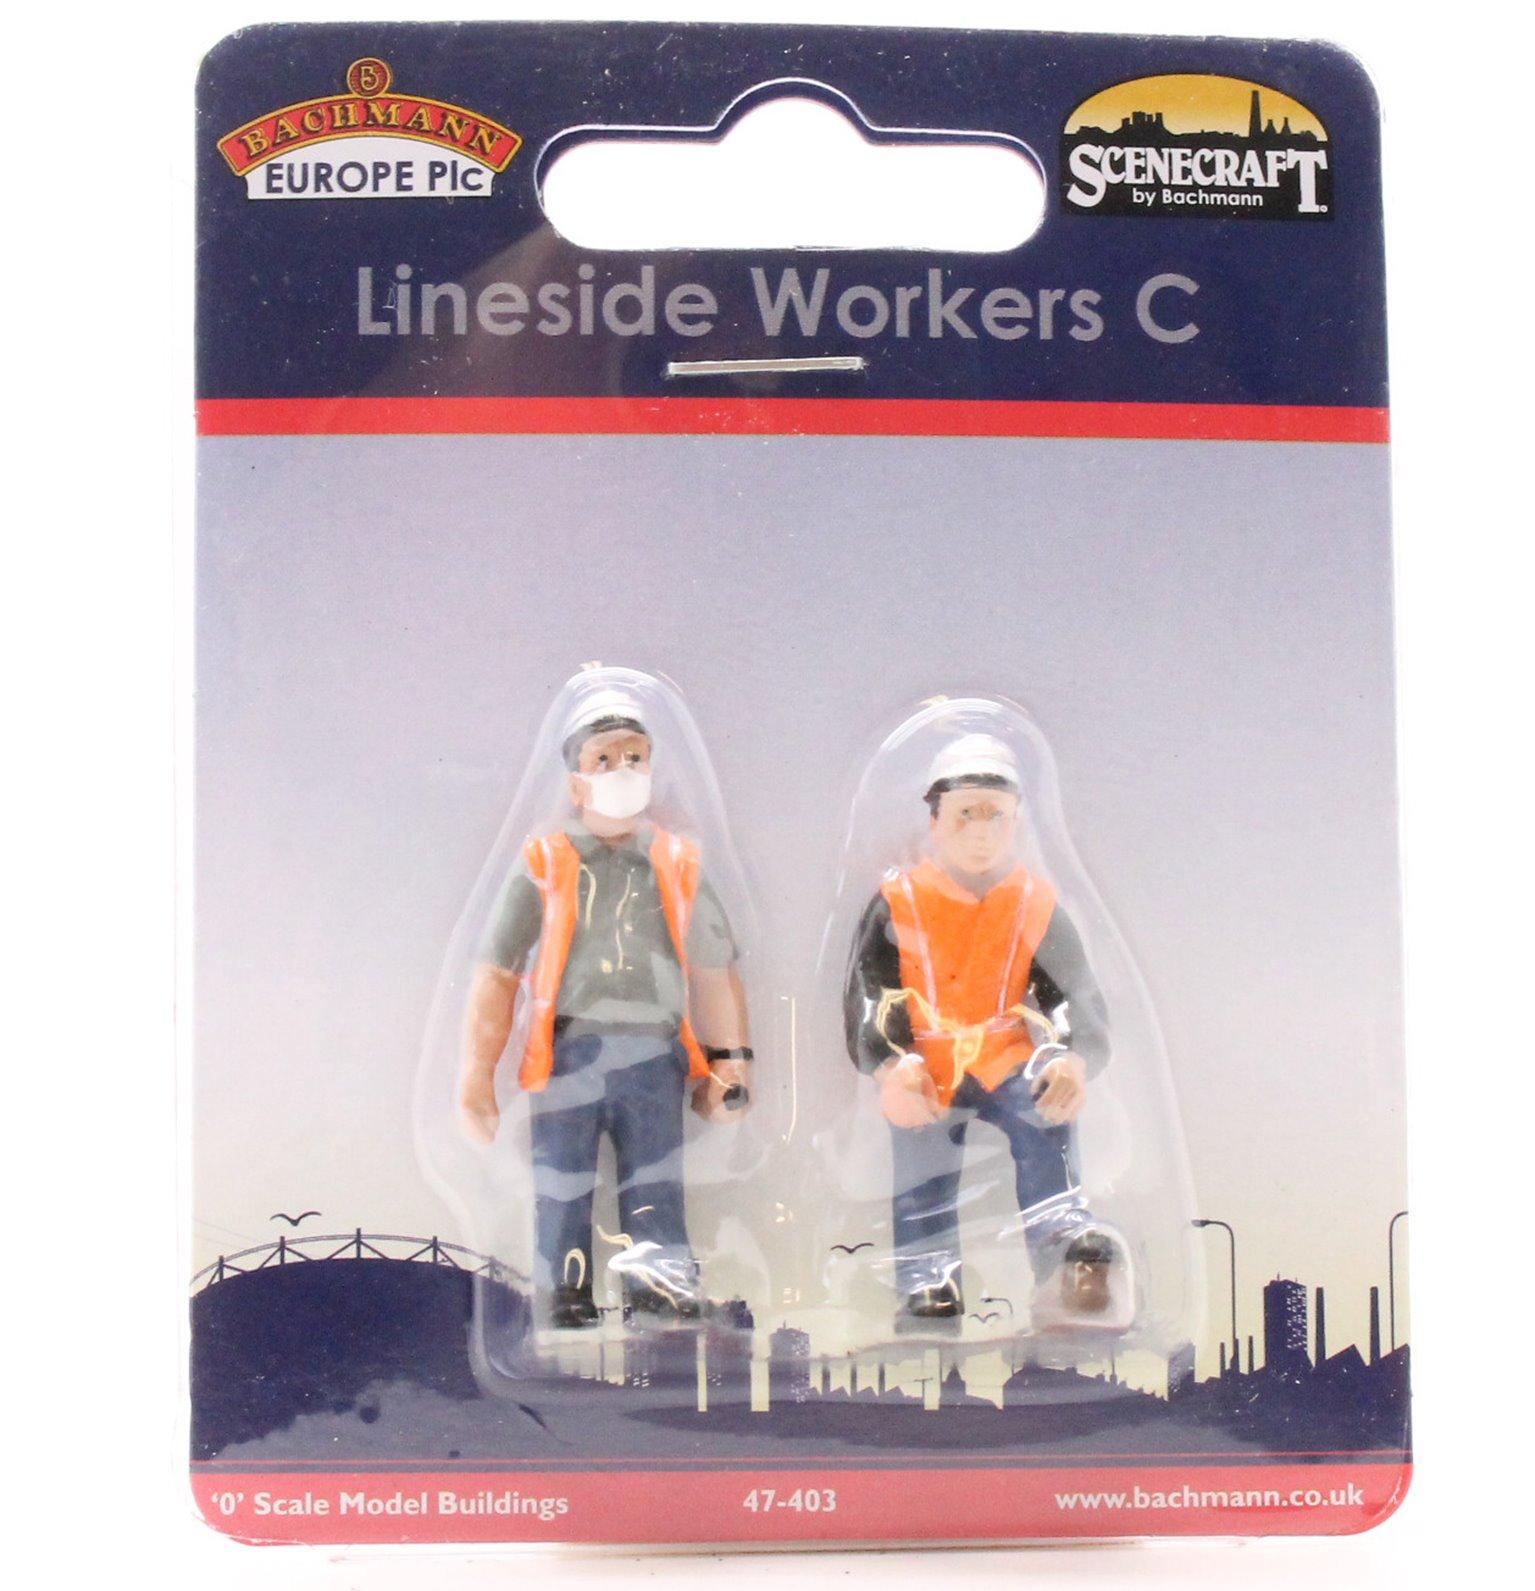 Lineside Workers C